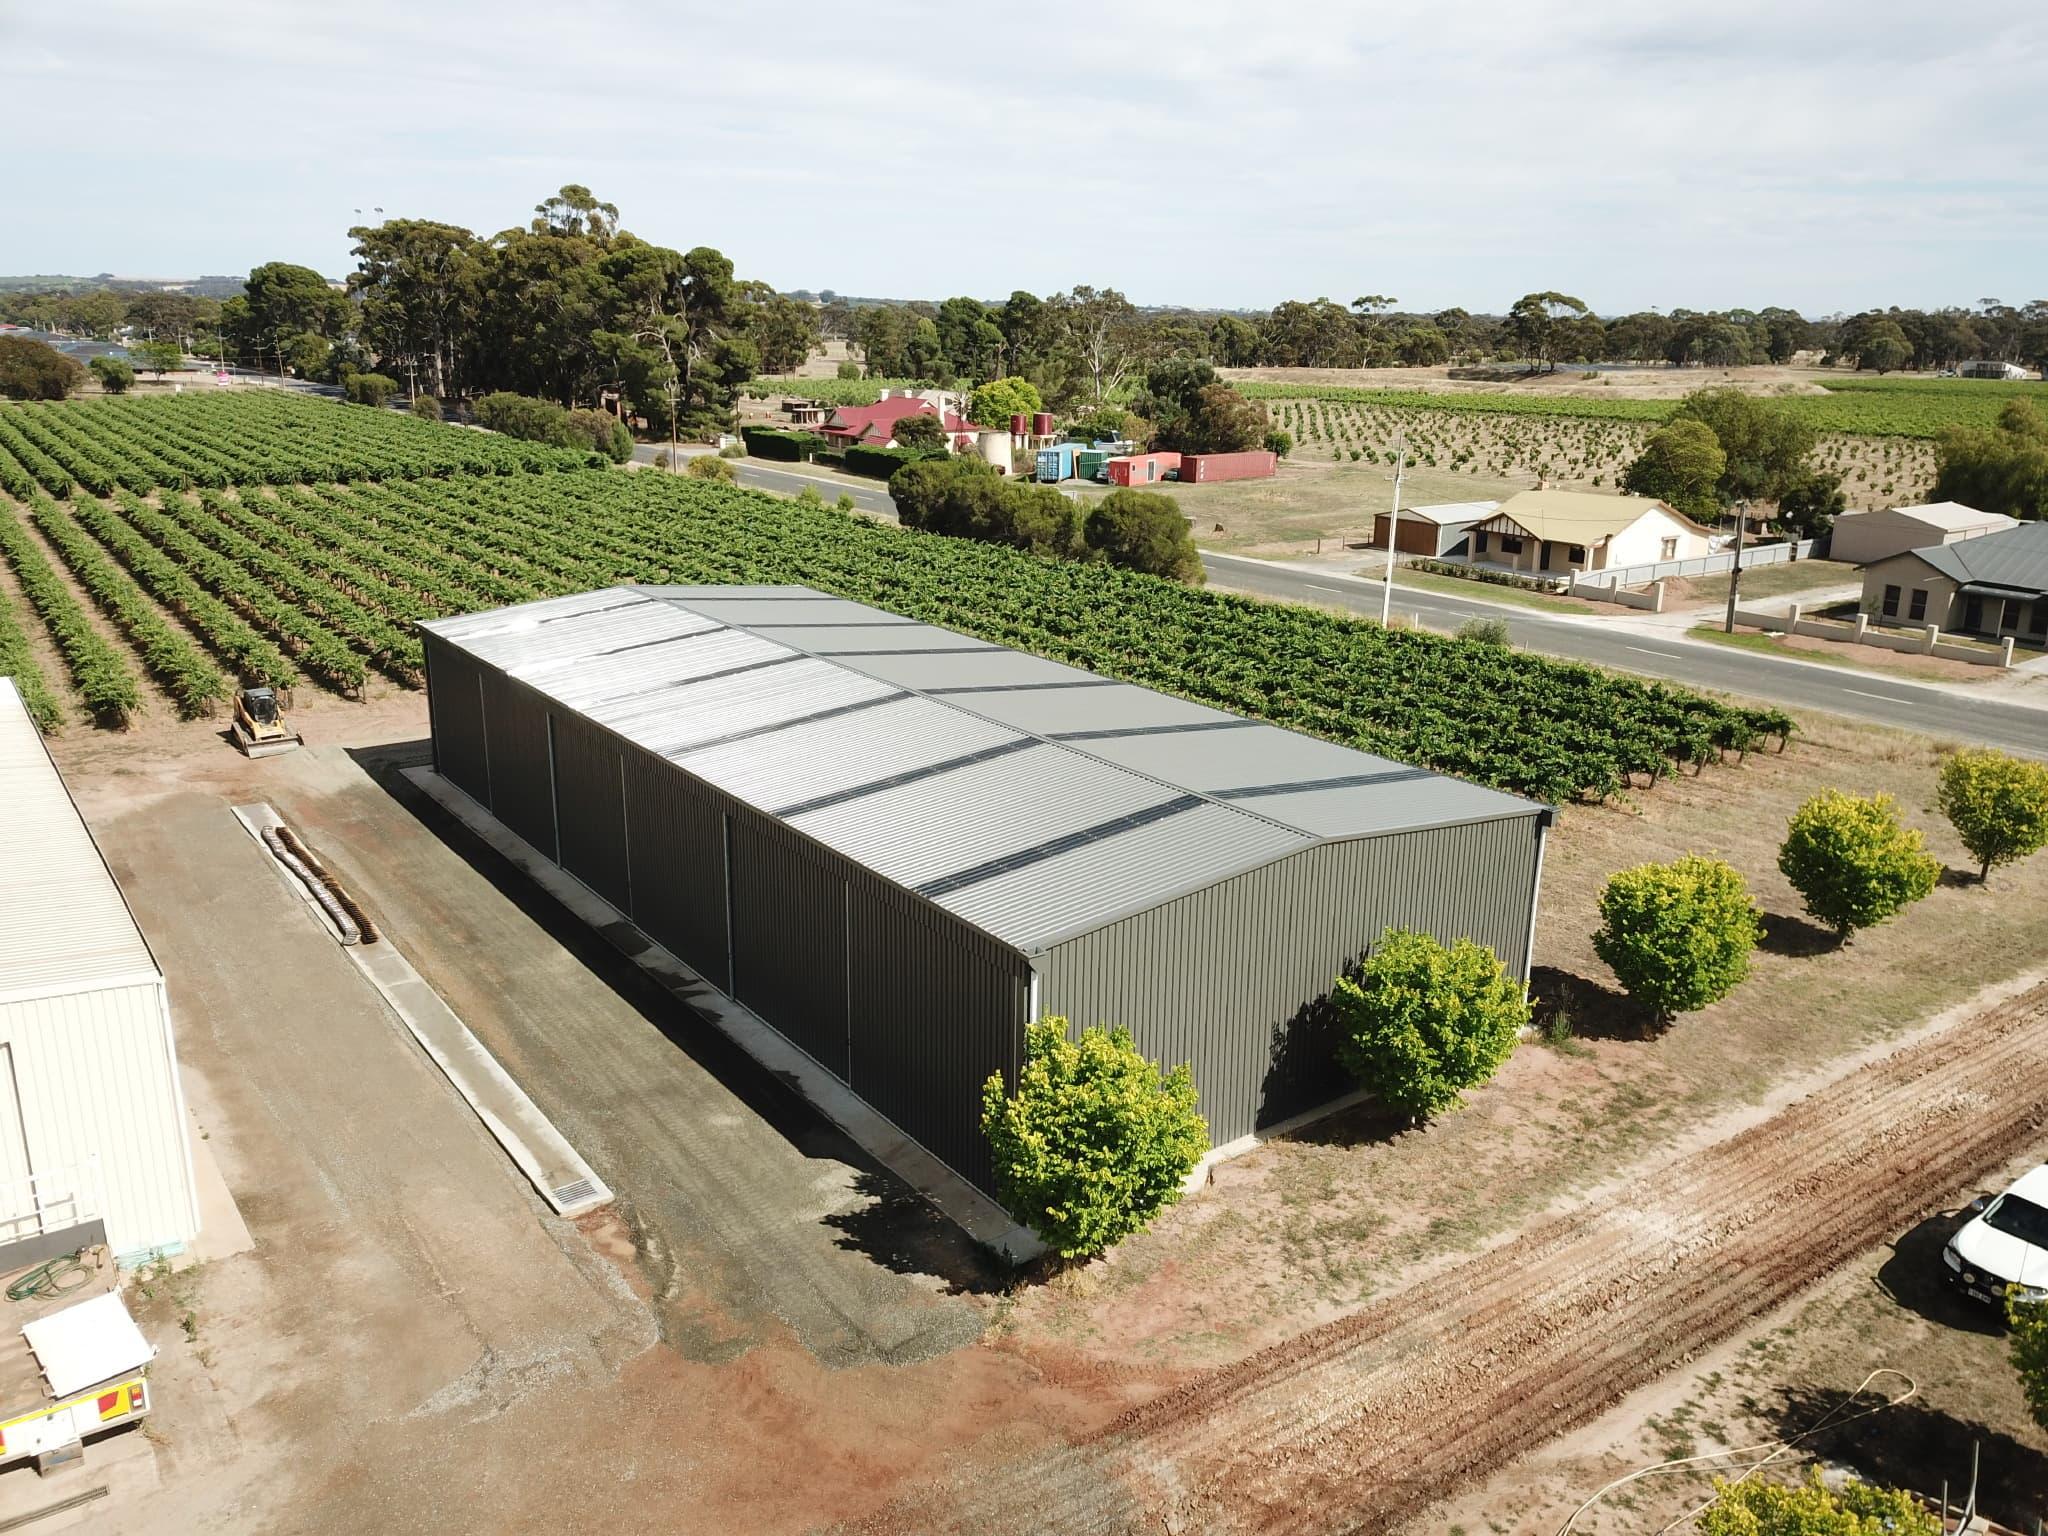 Vineyard Workshop / Machinery Sheds